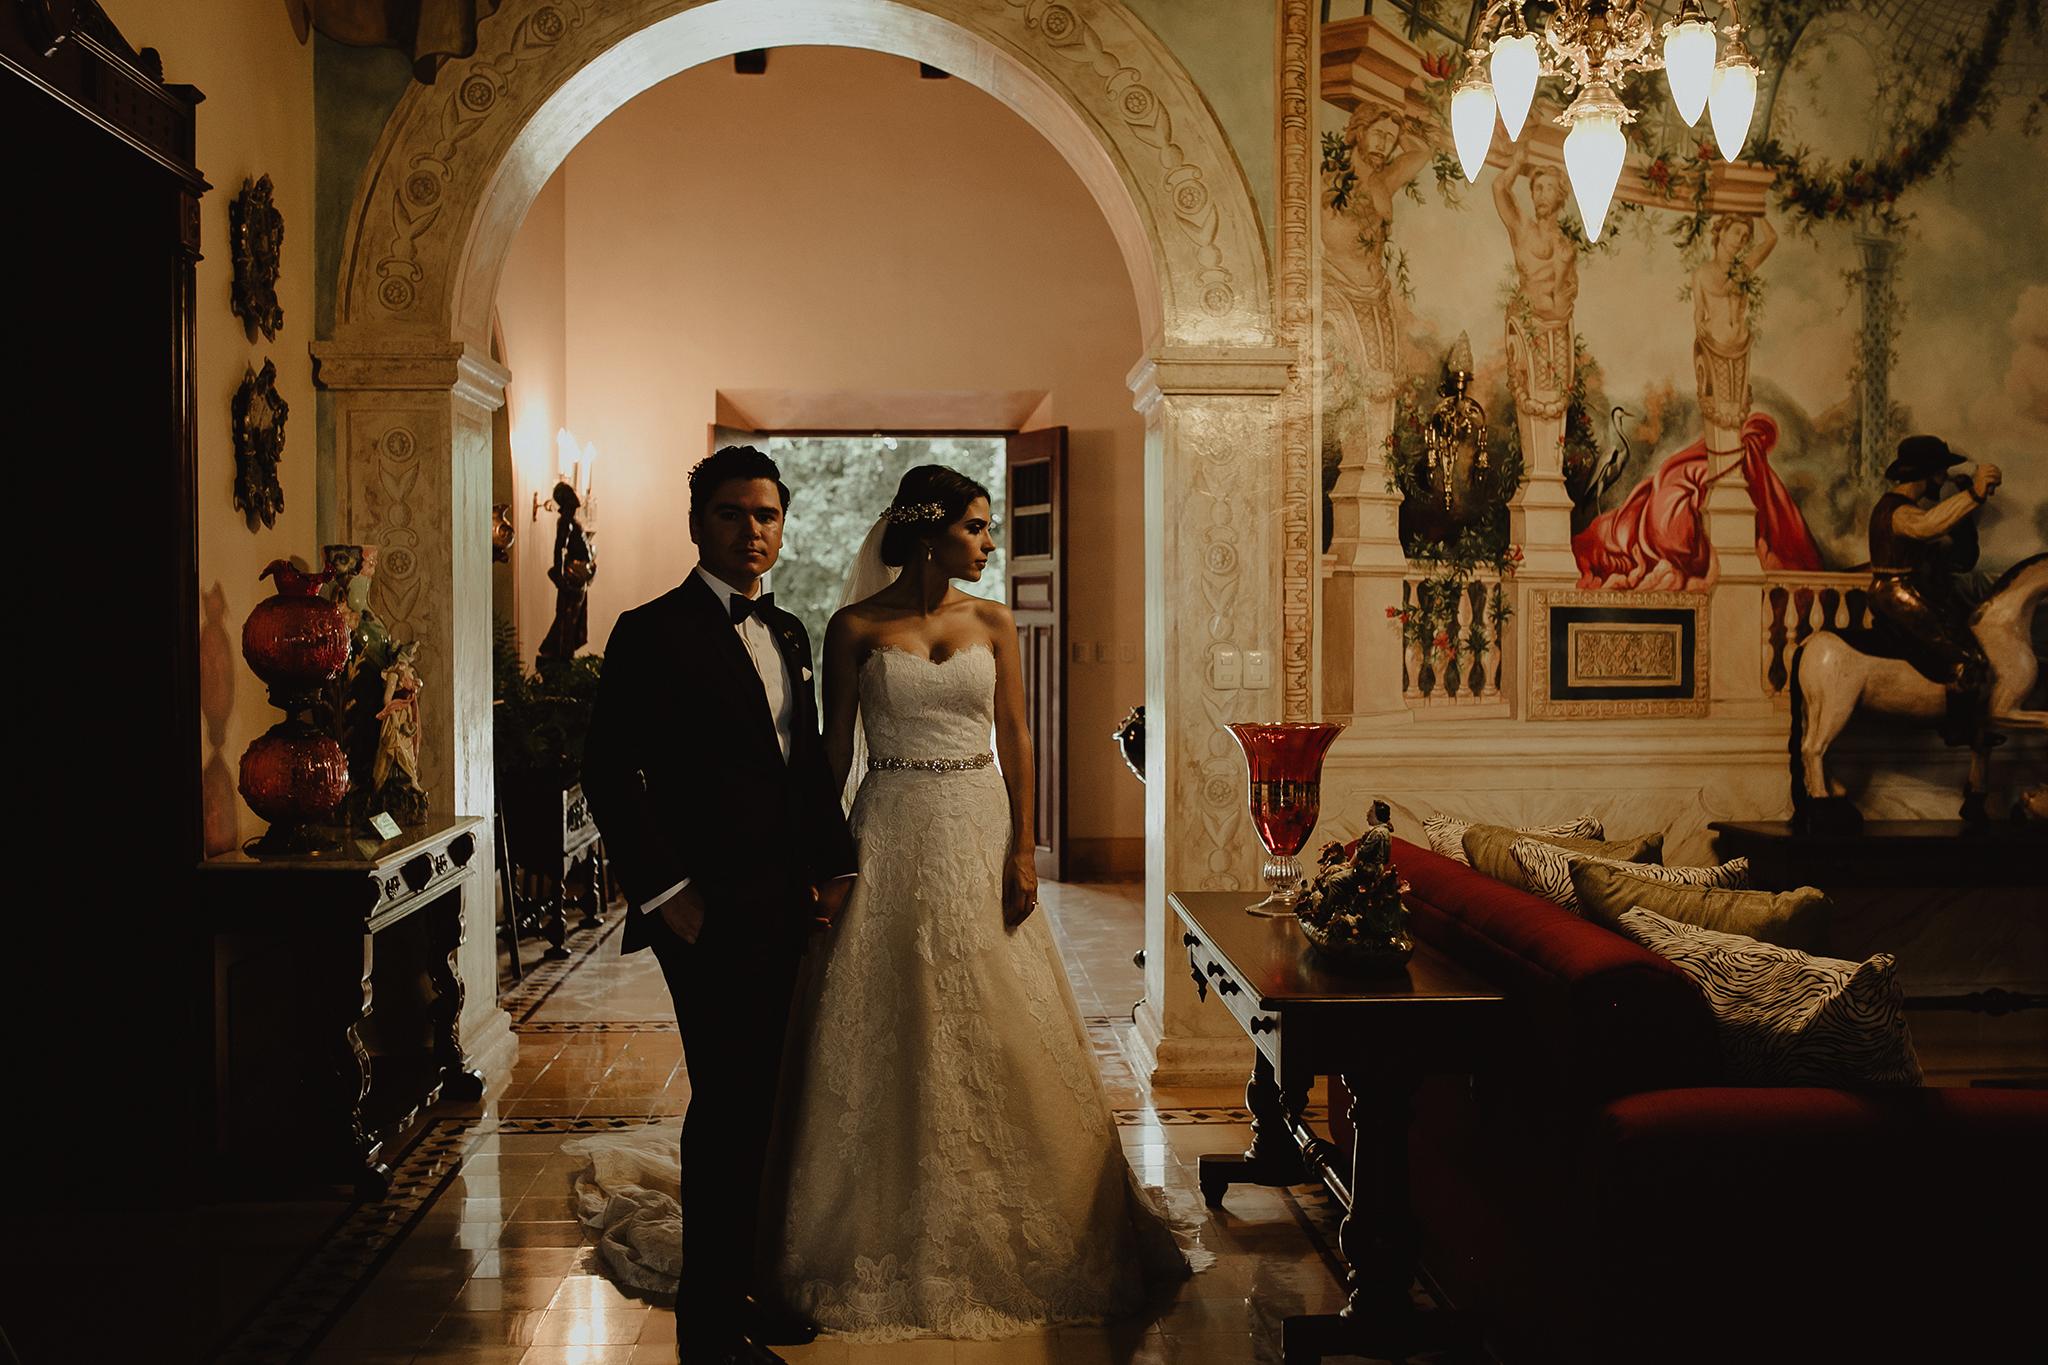 0156F&Yslide_WeddingDstination_MeridaYucatan_HaciendasMerida_BodasMexico_BodasYucatan_Boda_Destino.jpg